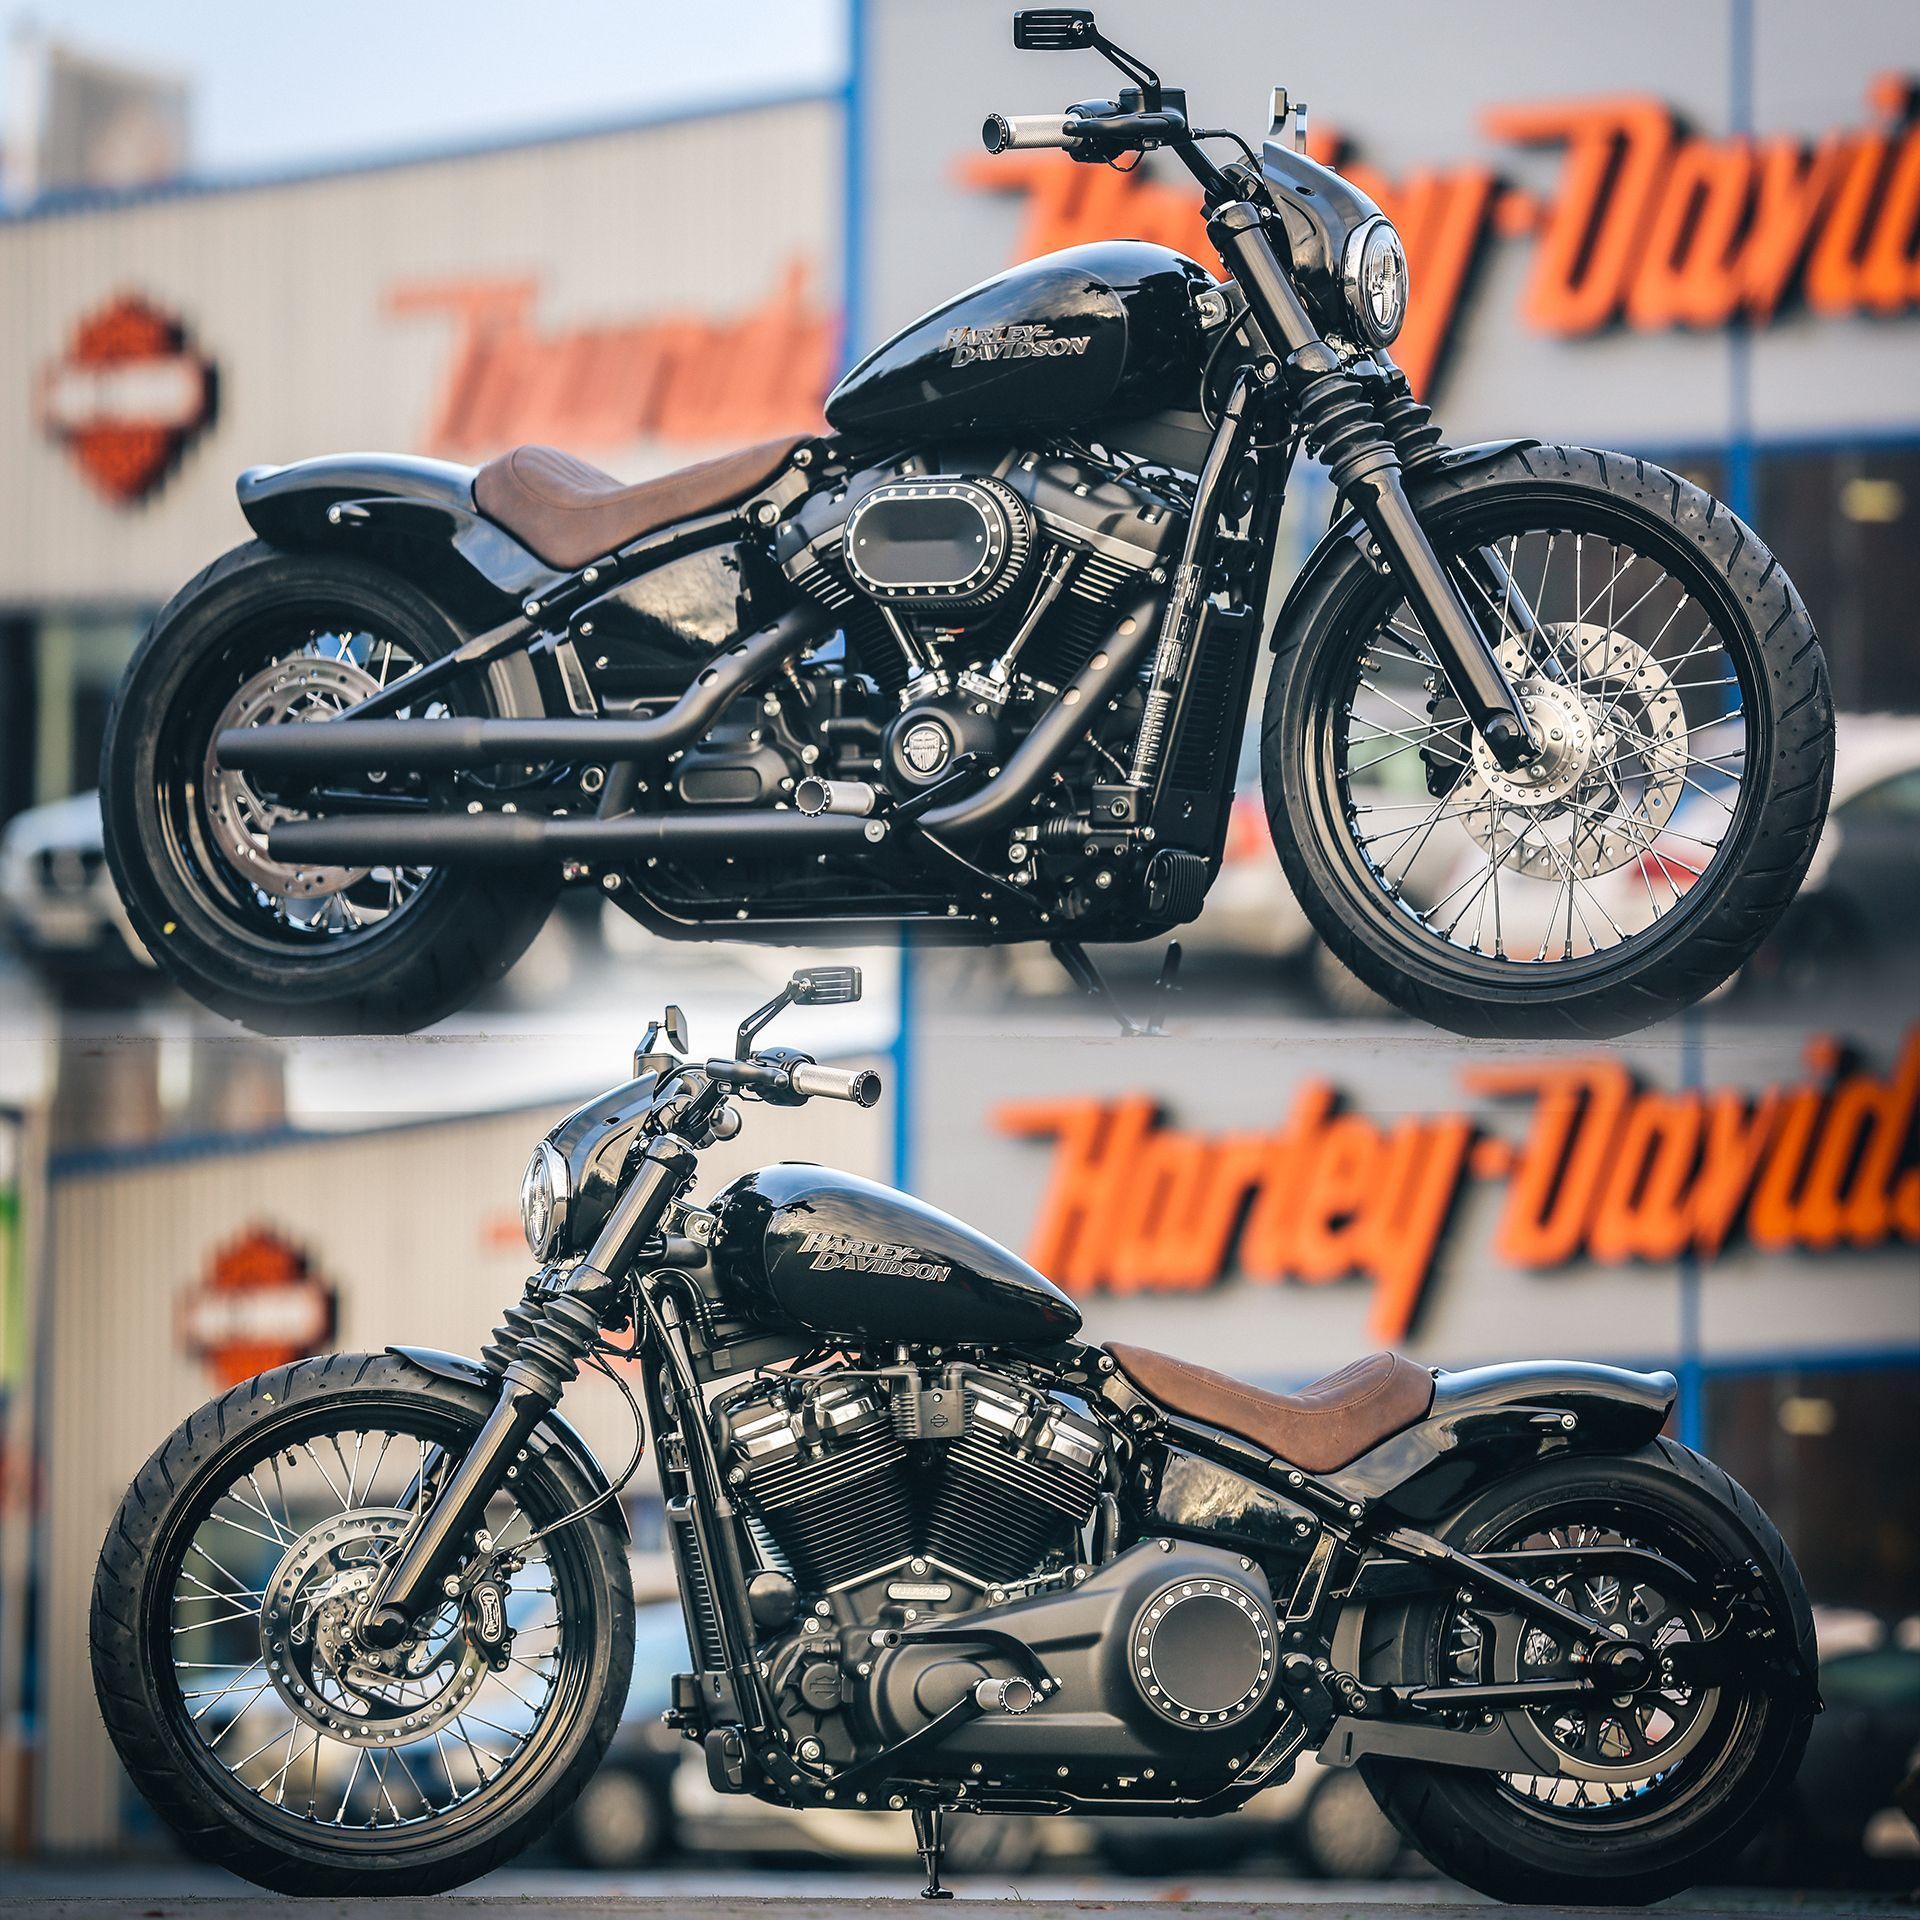 Thunderbike Shorty Customized Harley Davidson Softail Streetbob